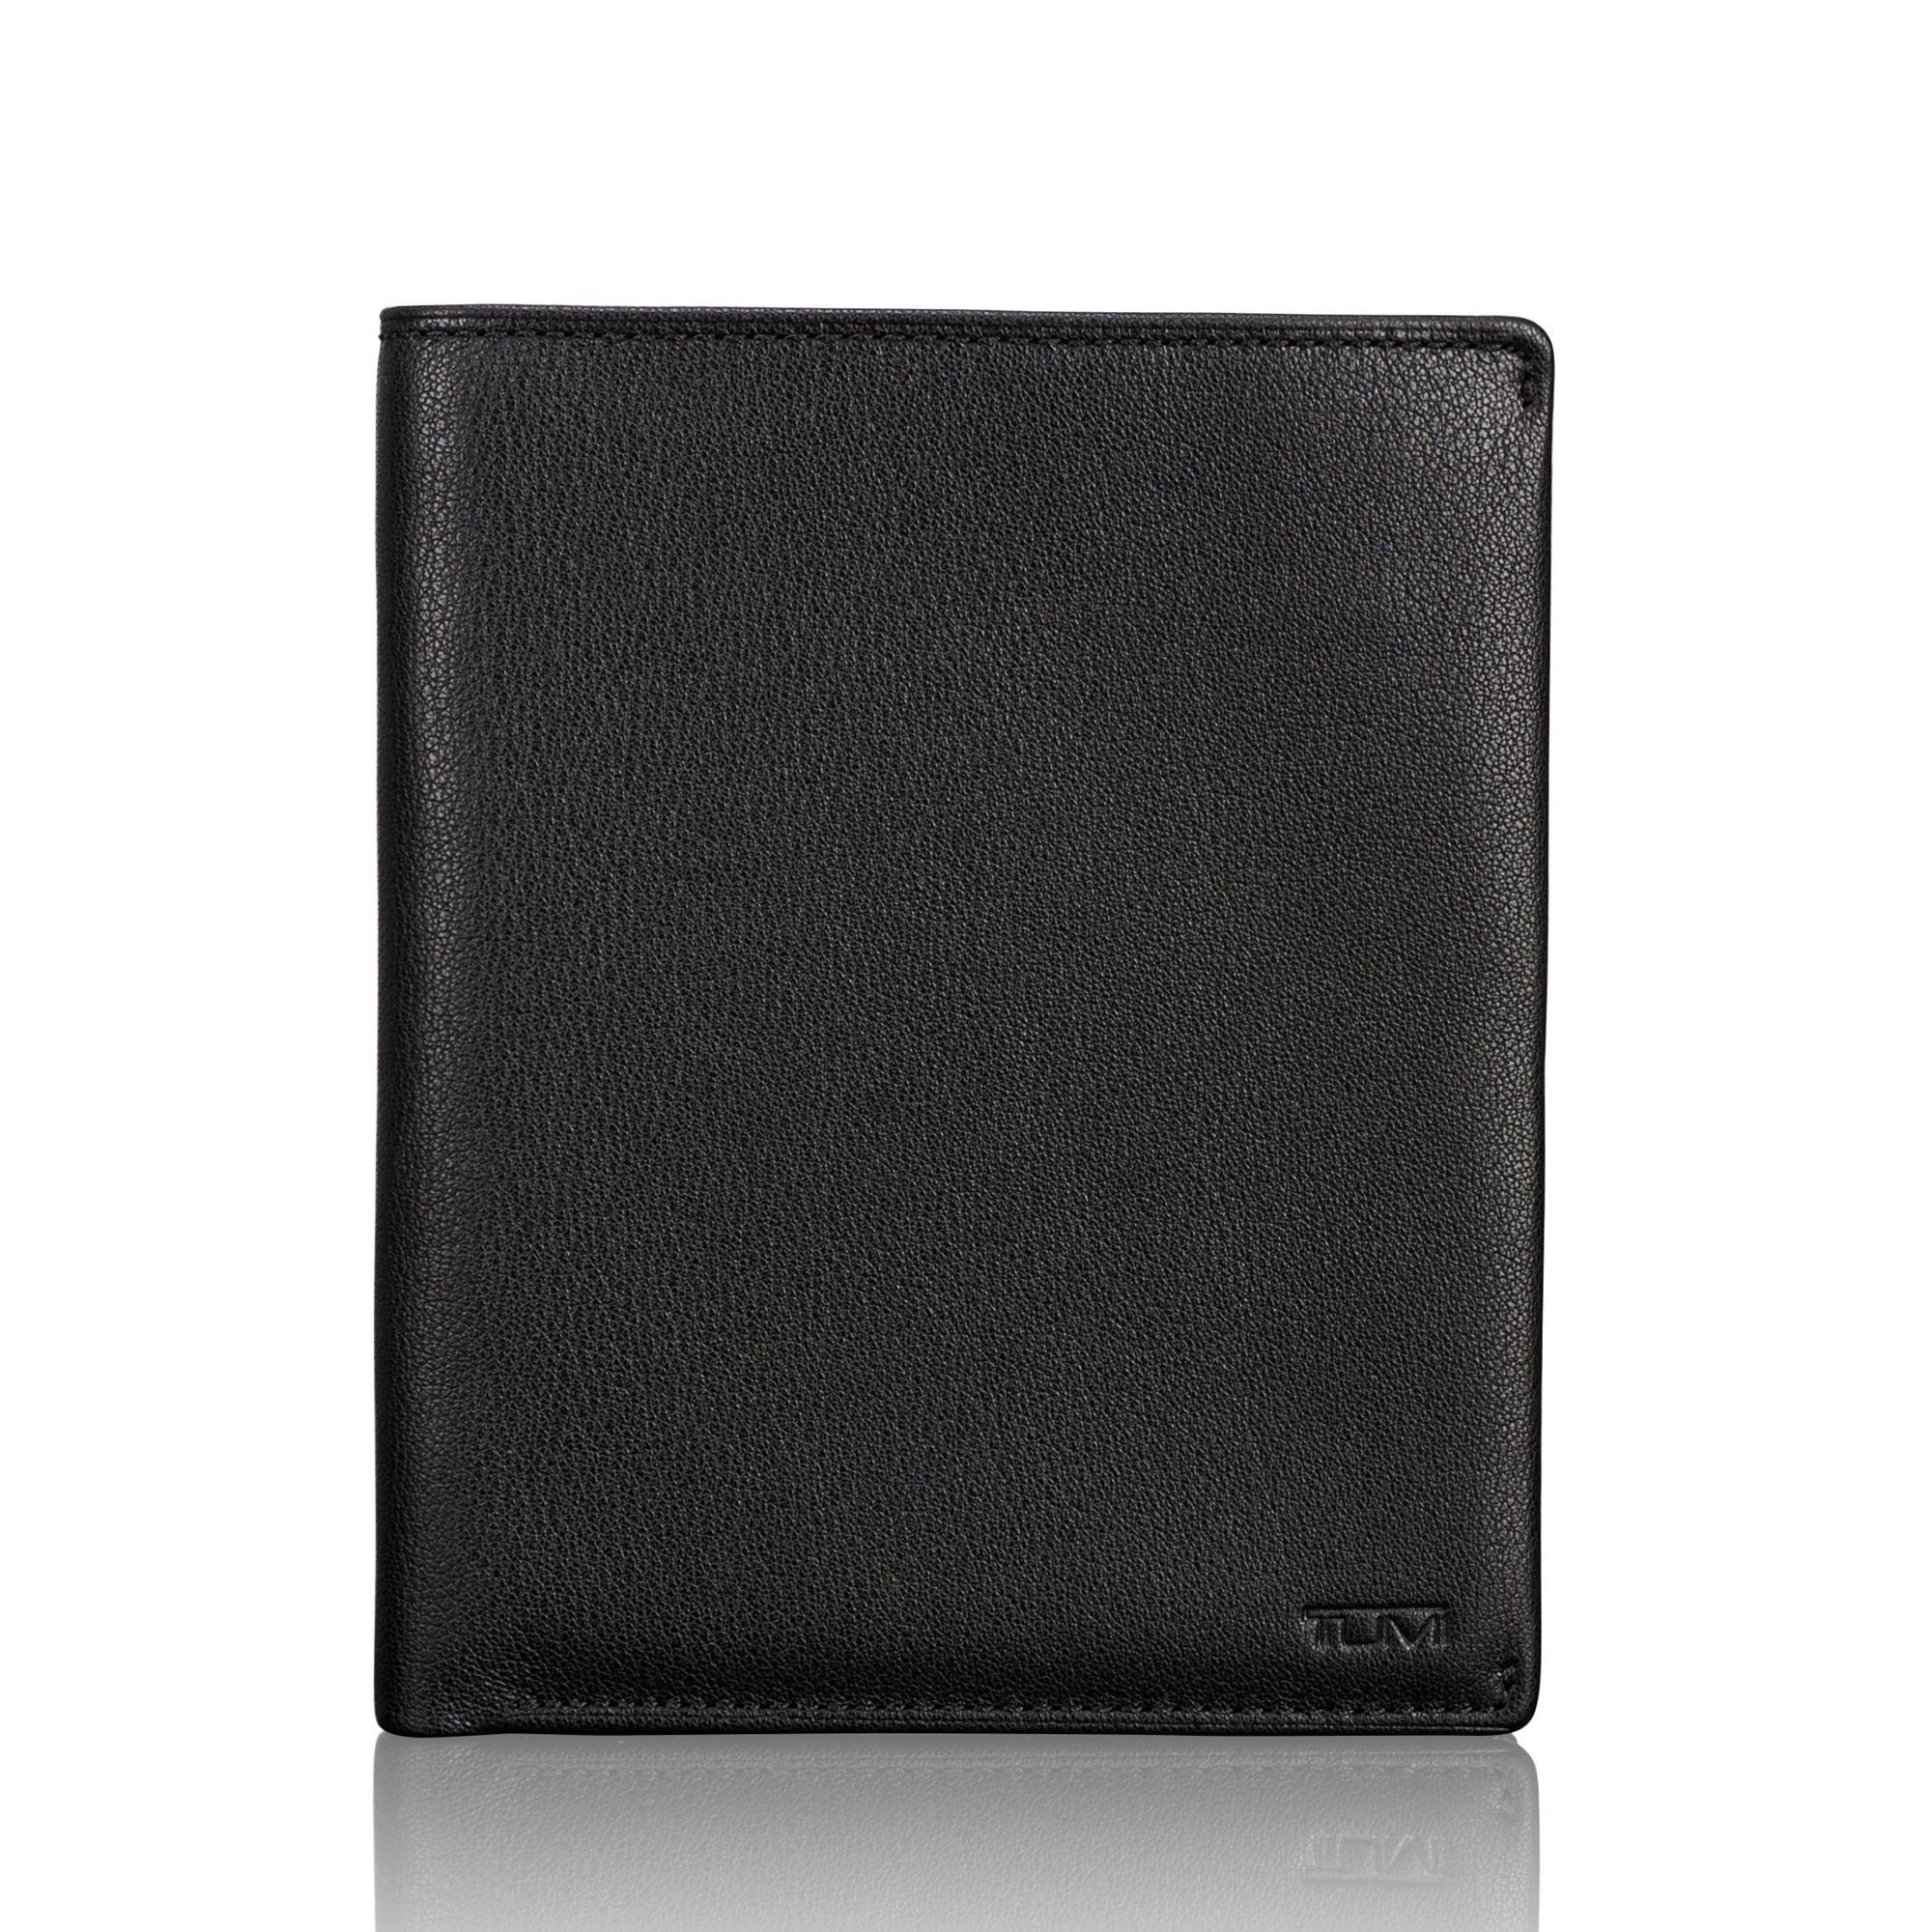 TUMI Men's Nassau Passport Case Accessory, -black textured, one size